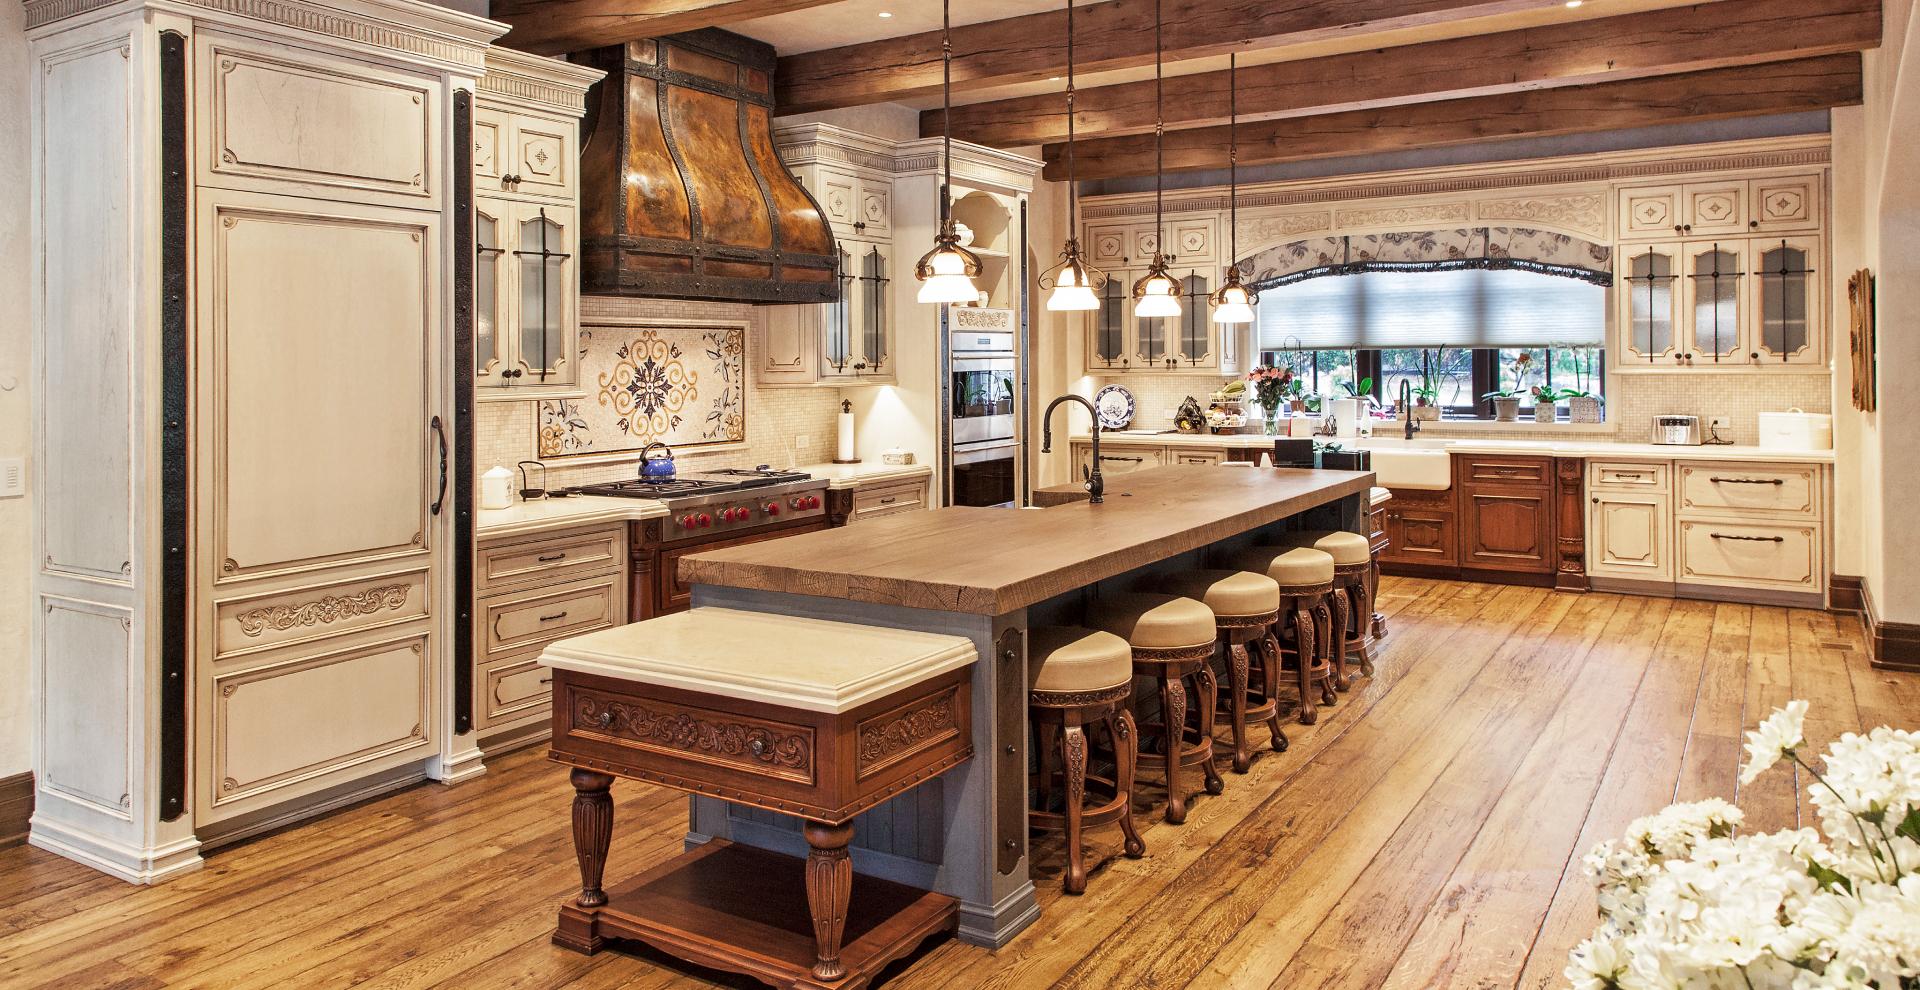 French provincial style kitchen Saddle River, NJ